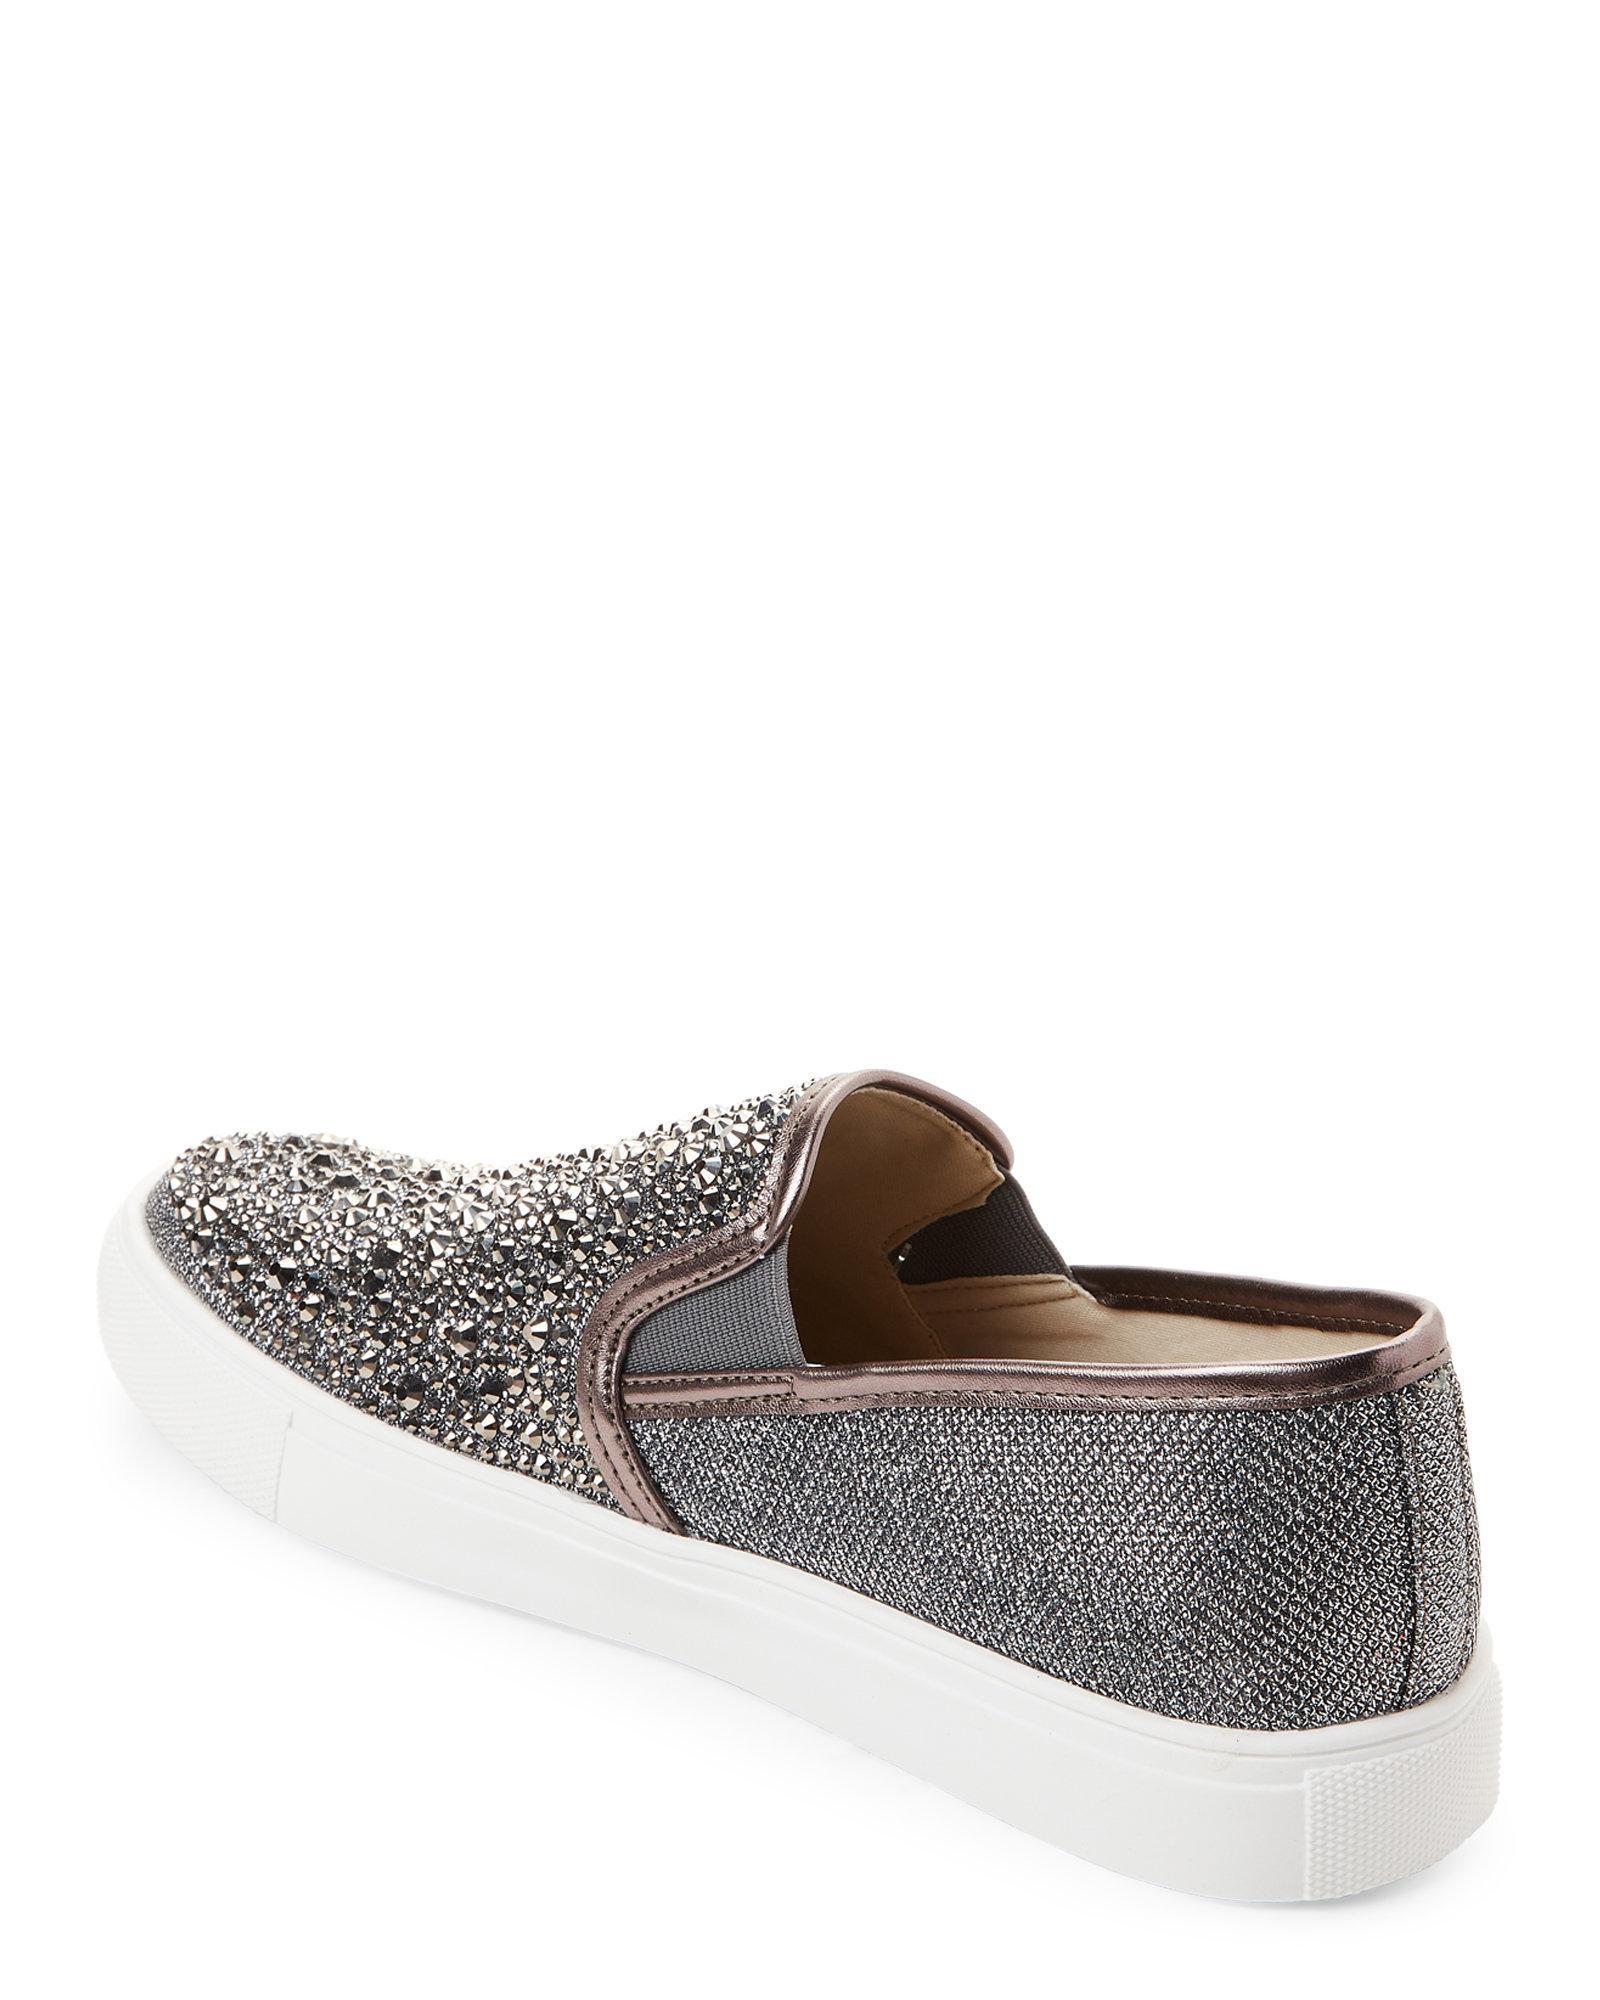 8280f1d880a8 Lyst - Steve Madden Pewter Macky Rhinestone Slip-on Sneakers